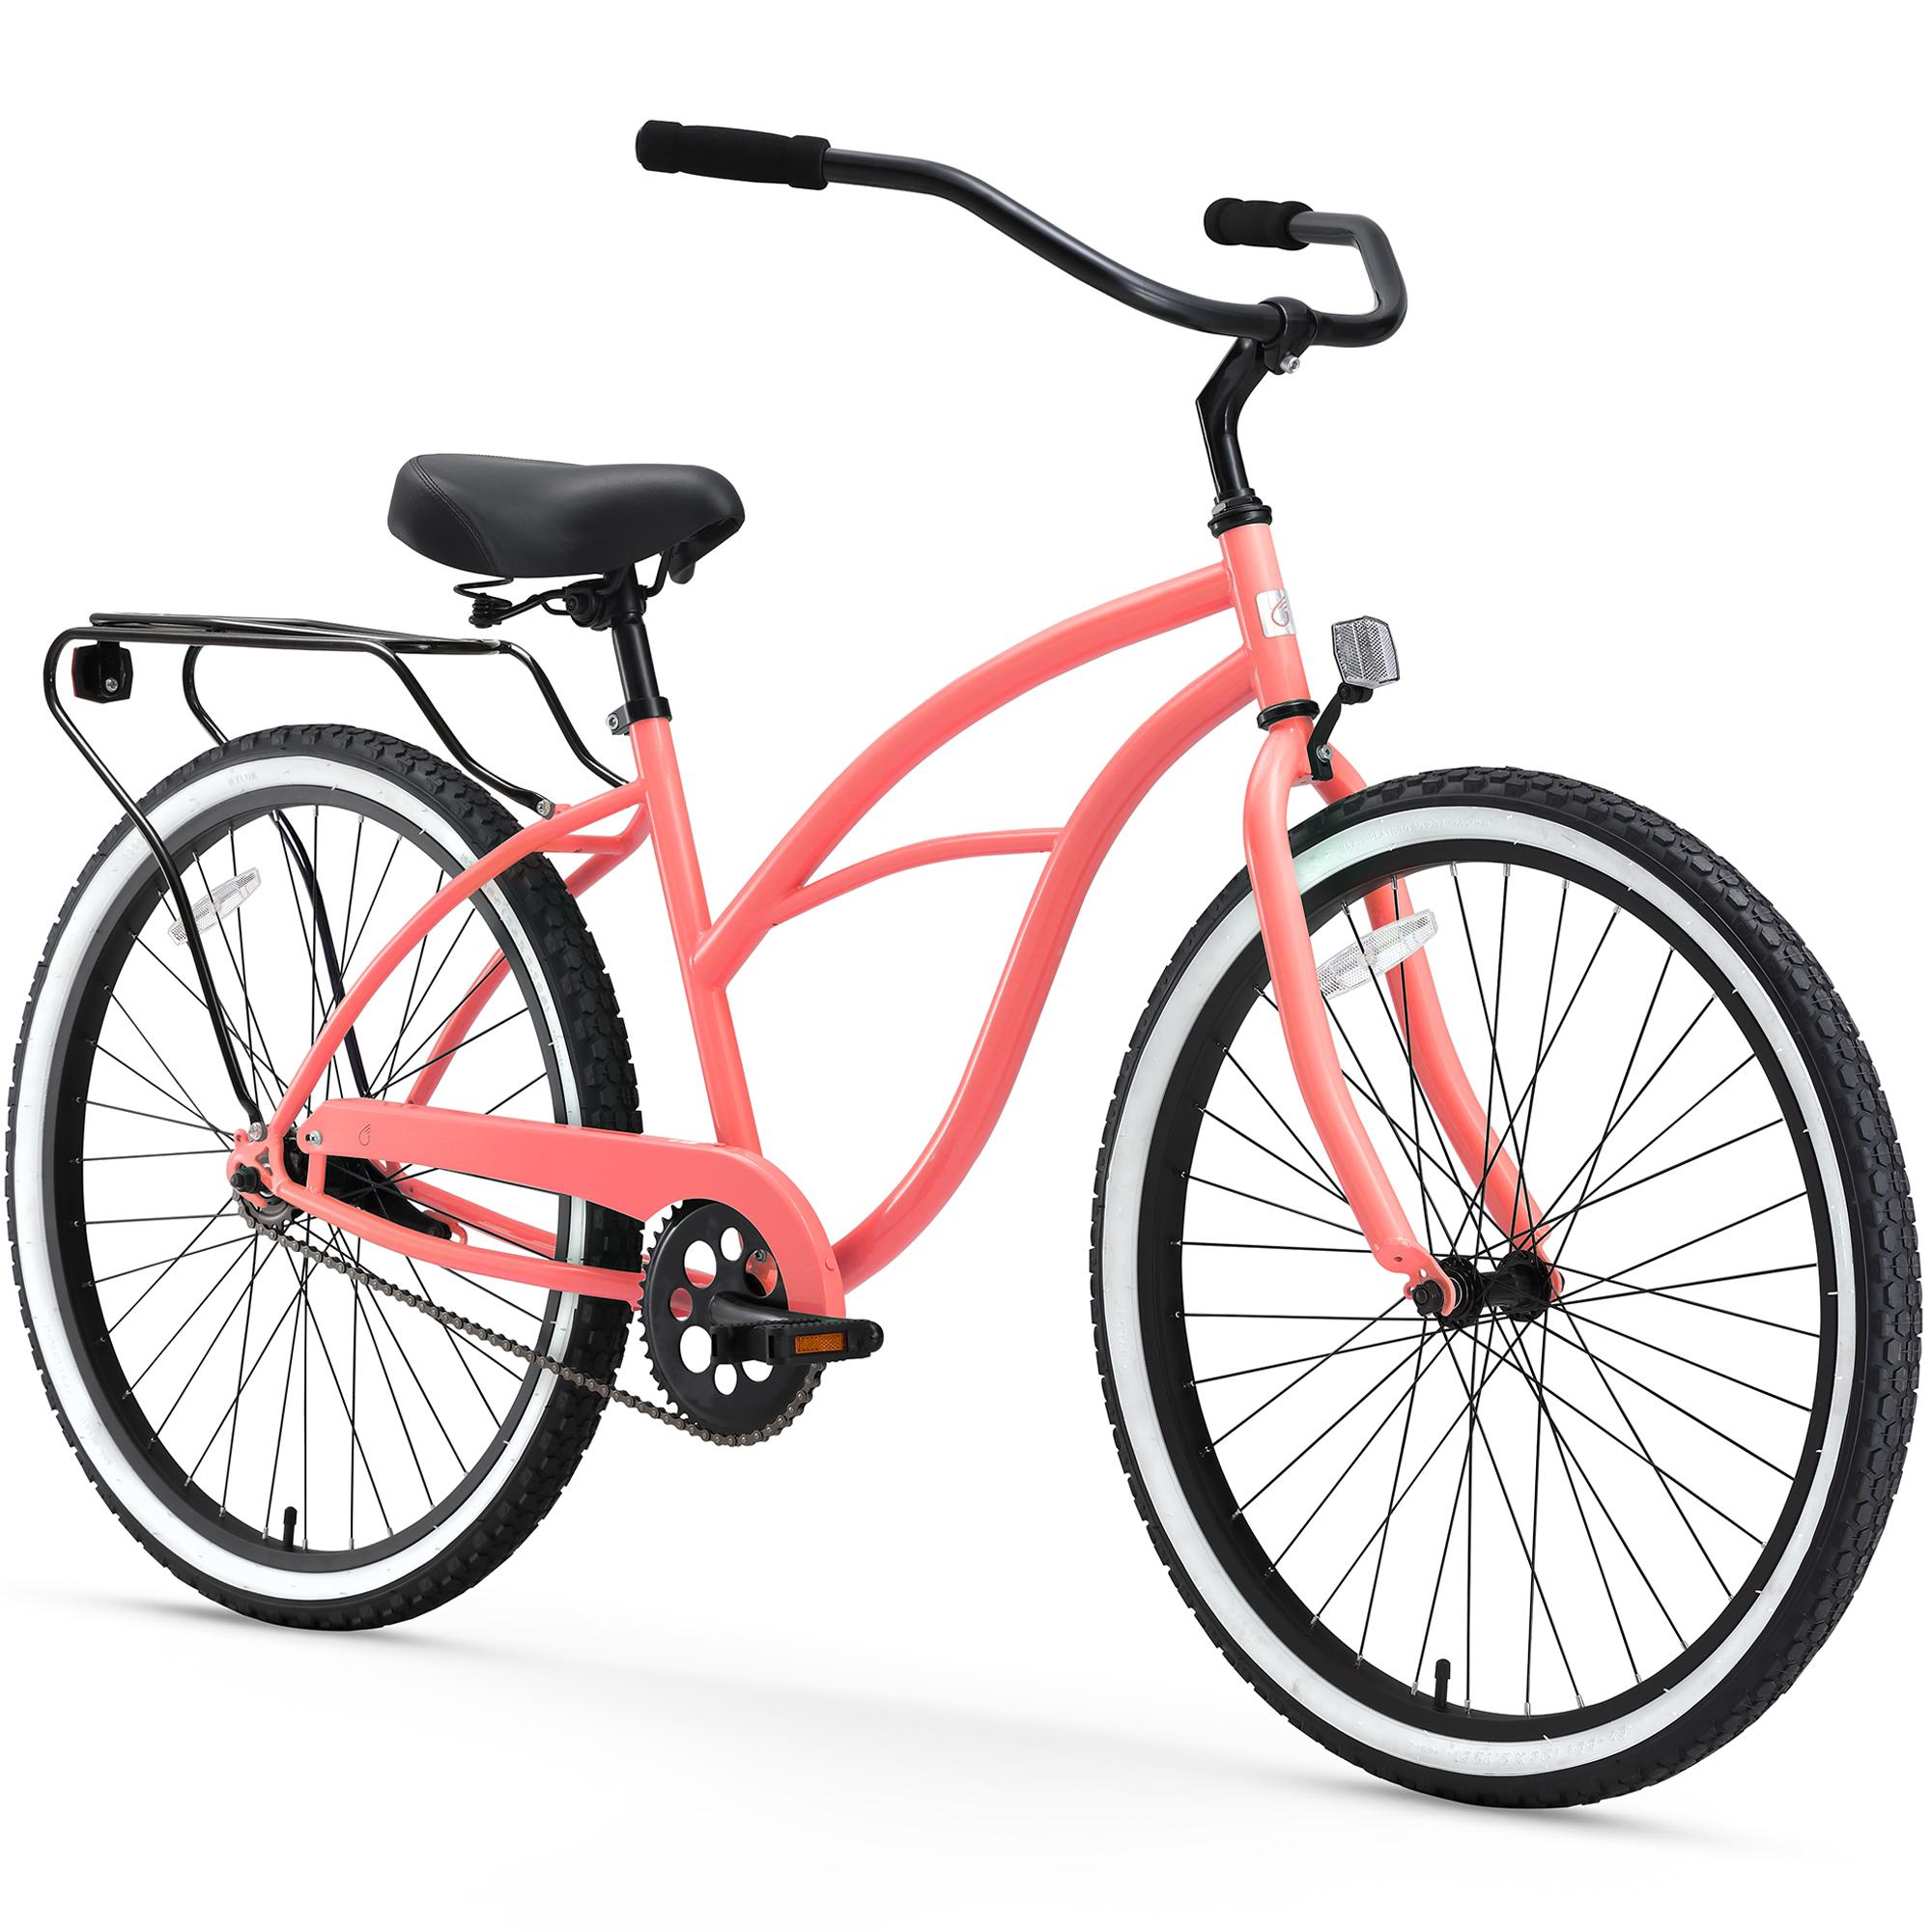 "26"" sixthreezero Women's Around the Block Single Speed Beach Cruiser Bicycle, Coral"